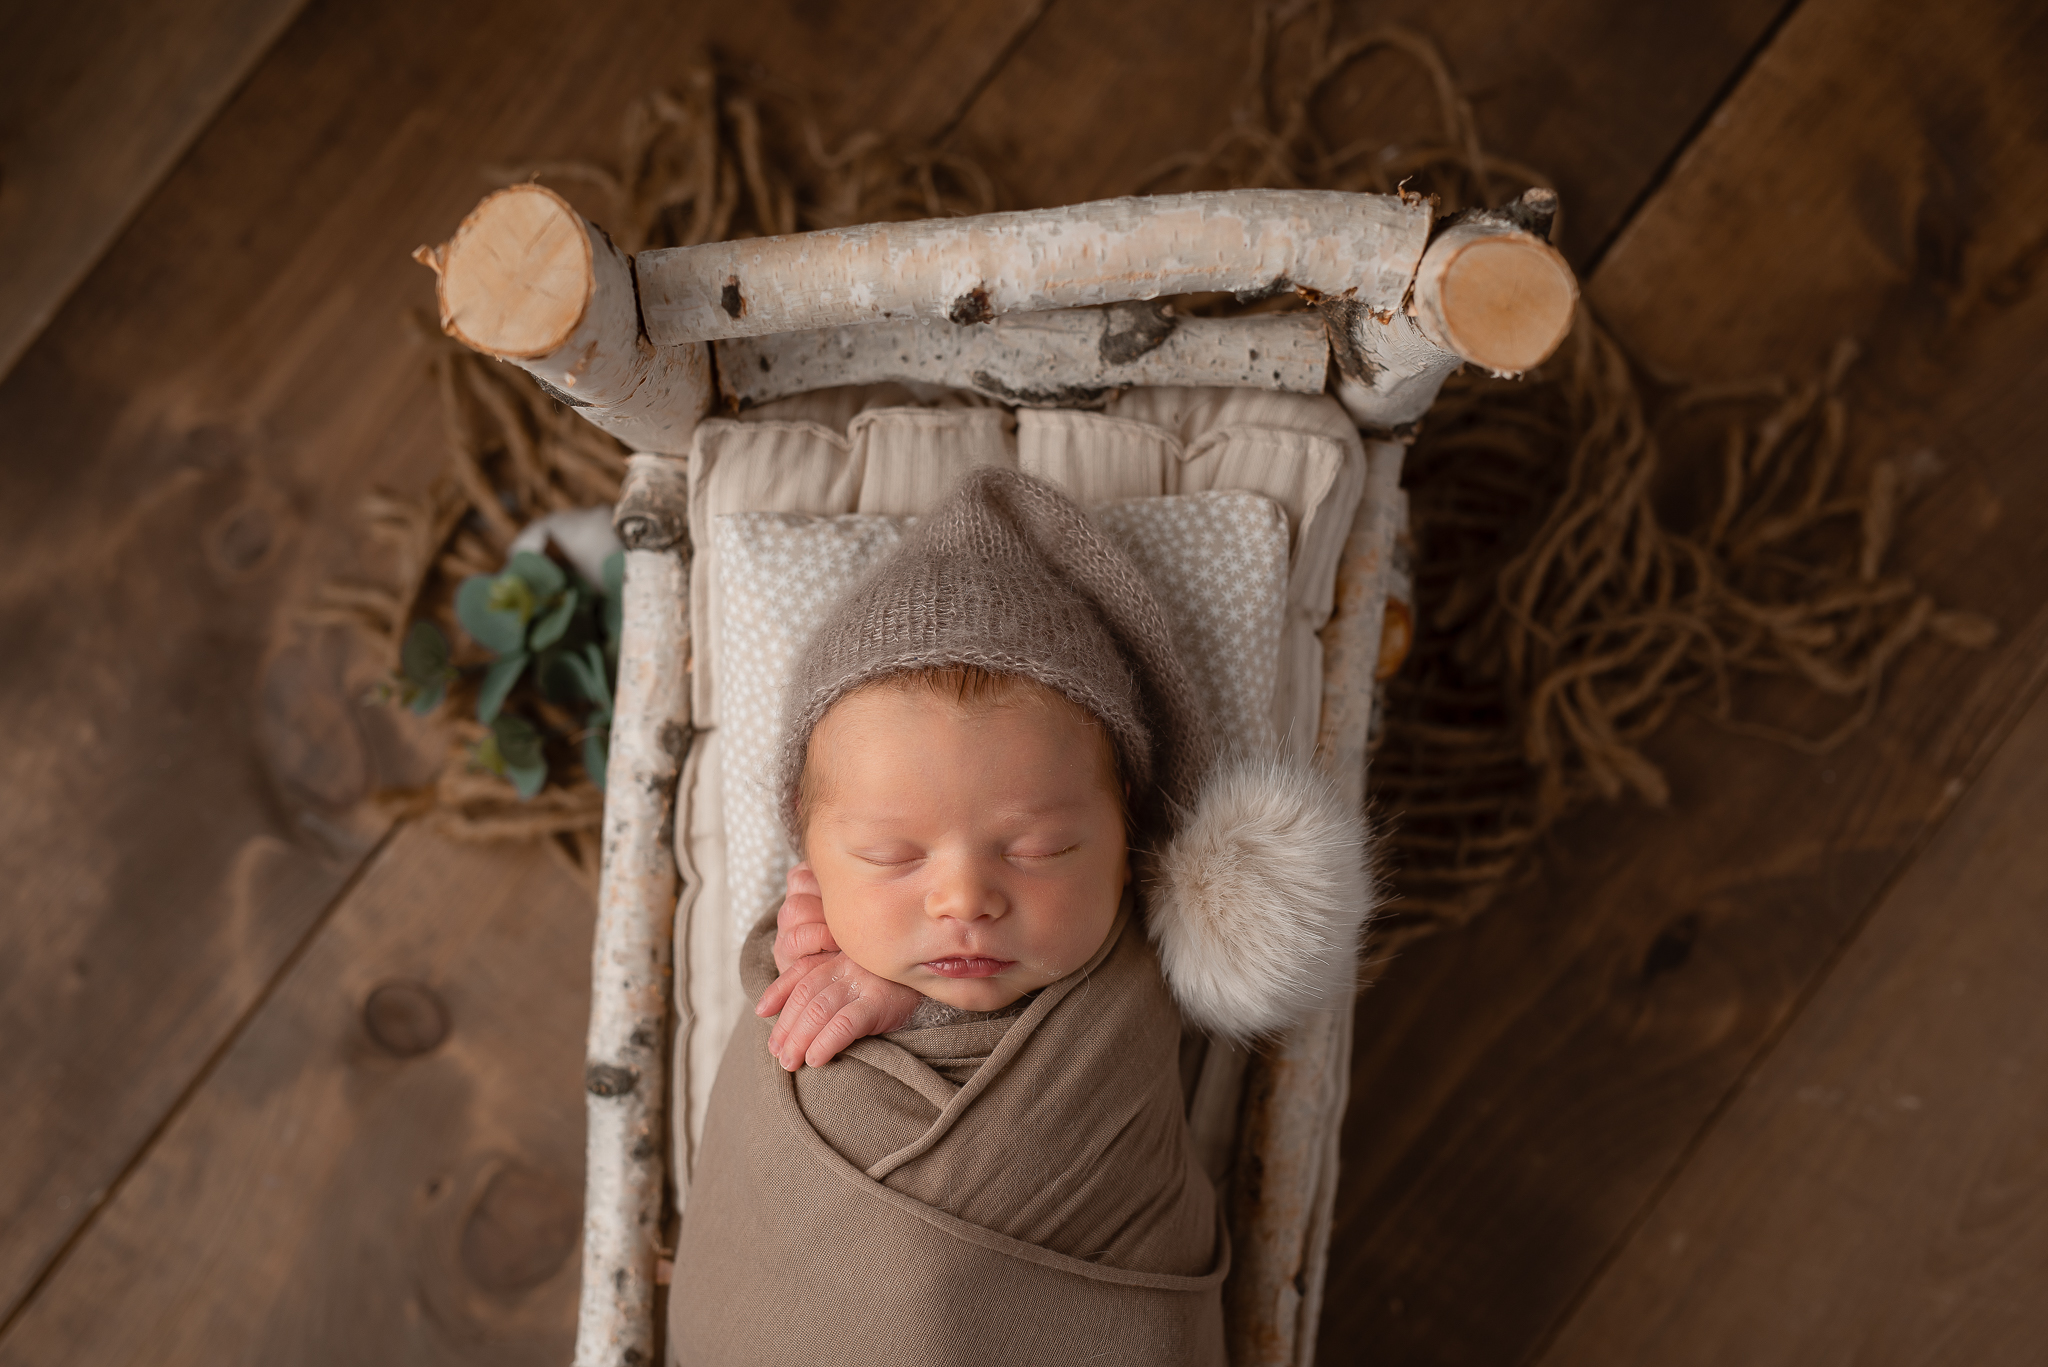 Newborn49NaomiLuciennePhotography062019-2-Edit-2.jpg